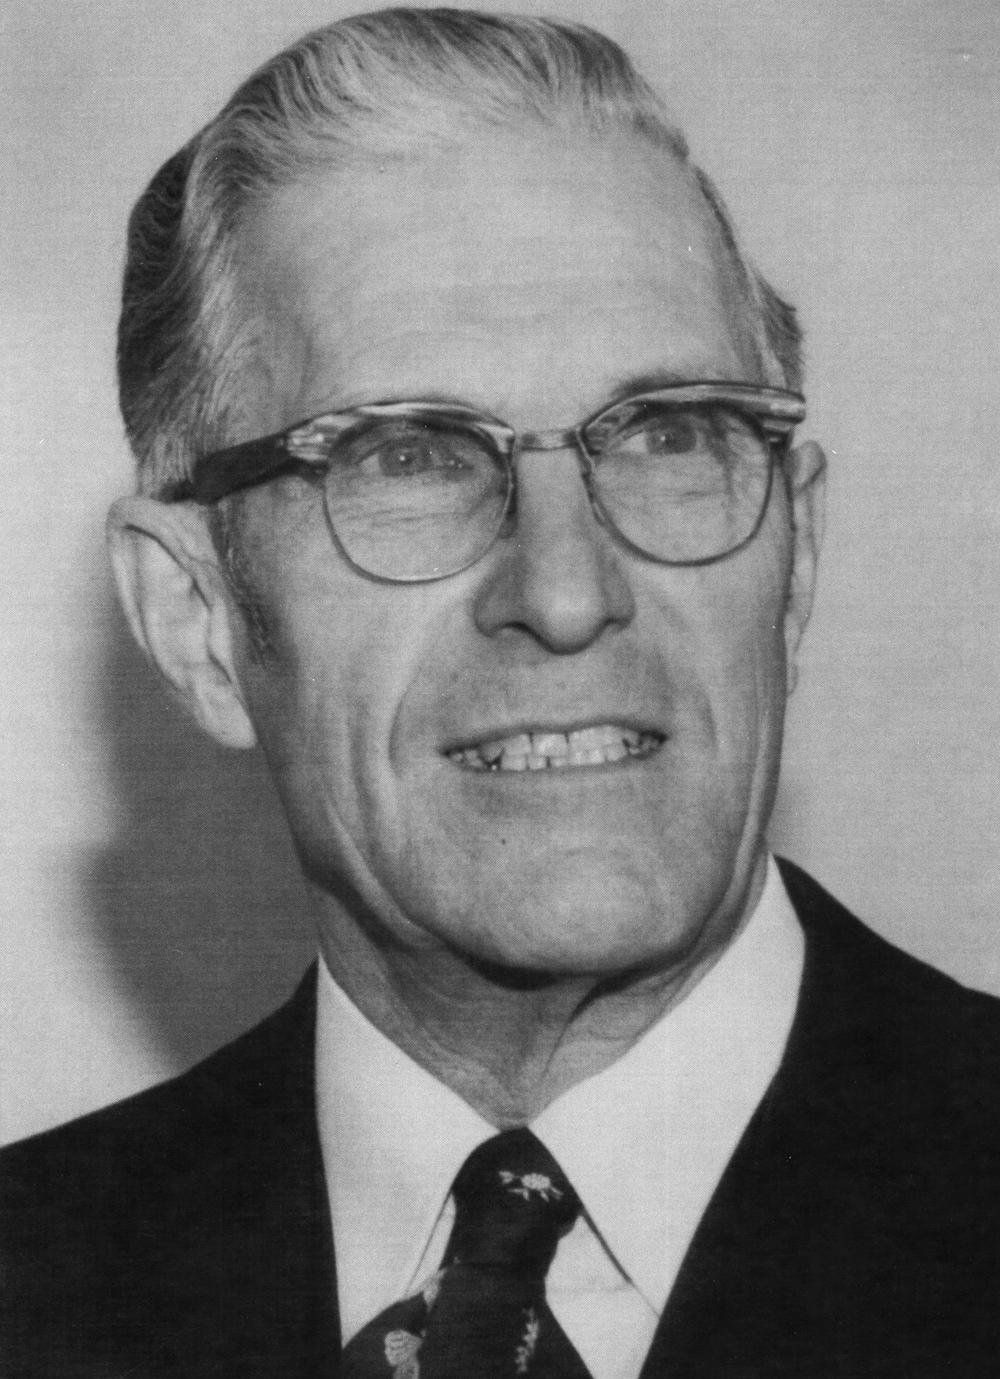 J. Donald Baxter